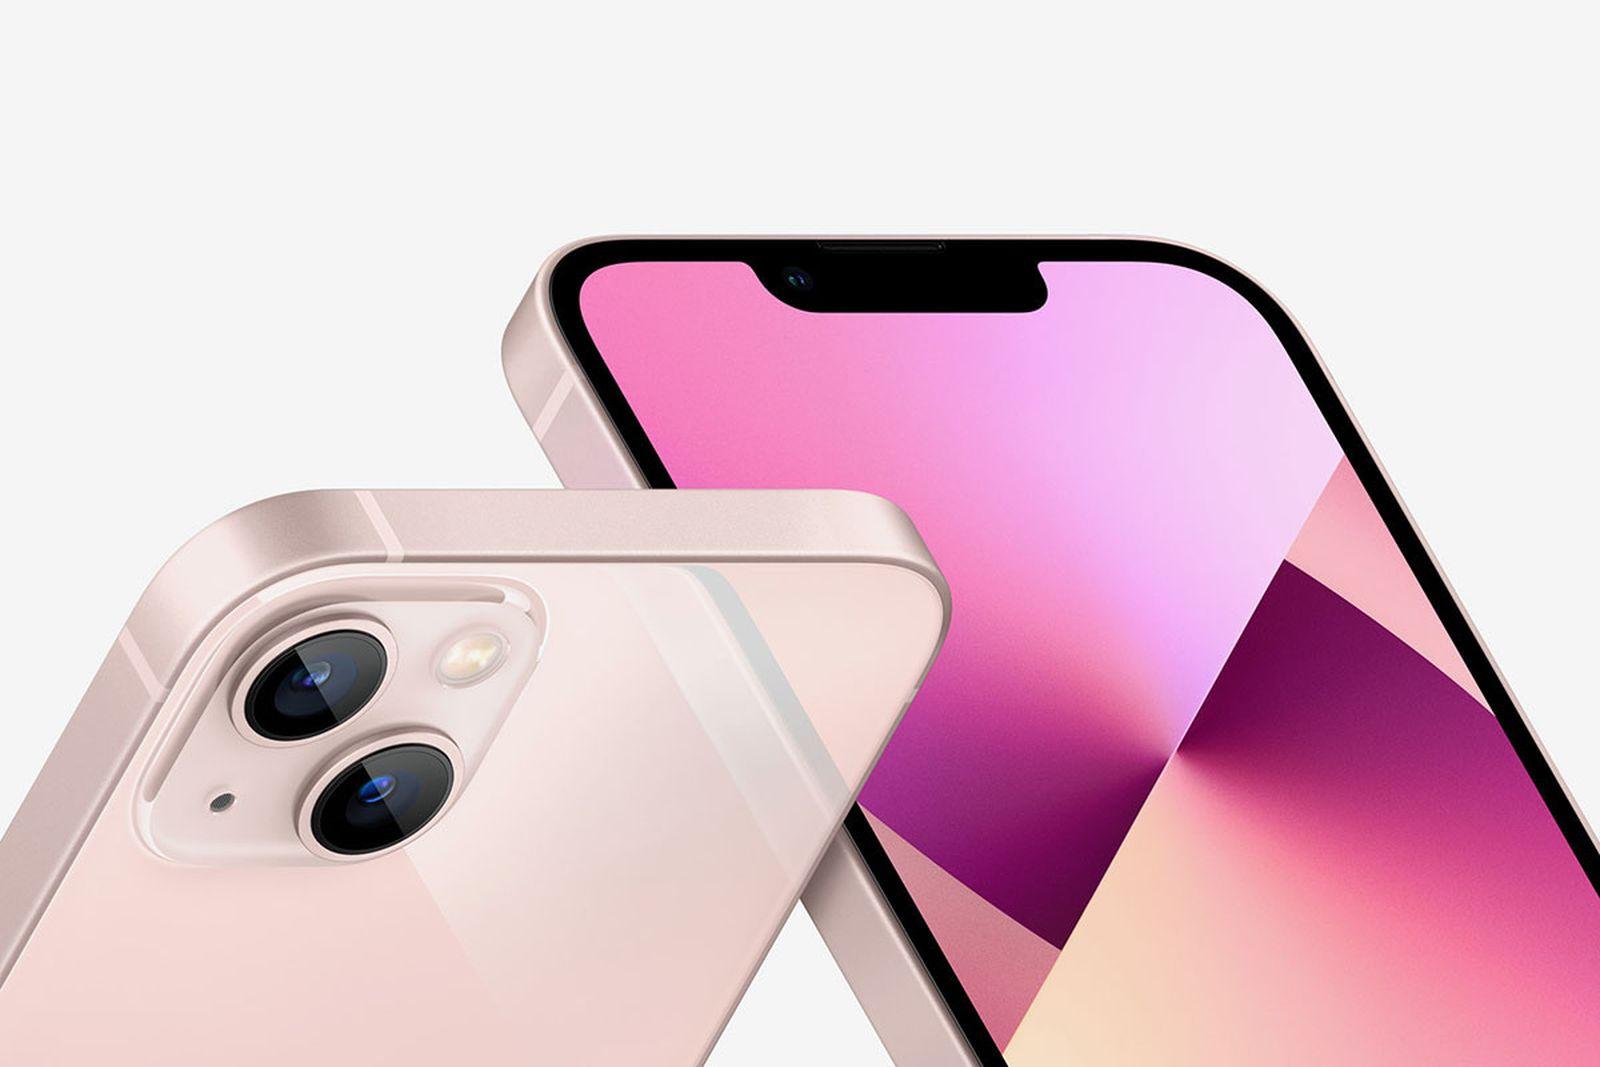 apple-iphone-13-pro-max-04